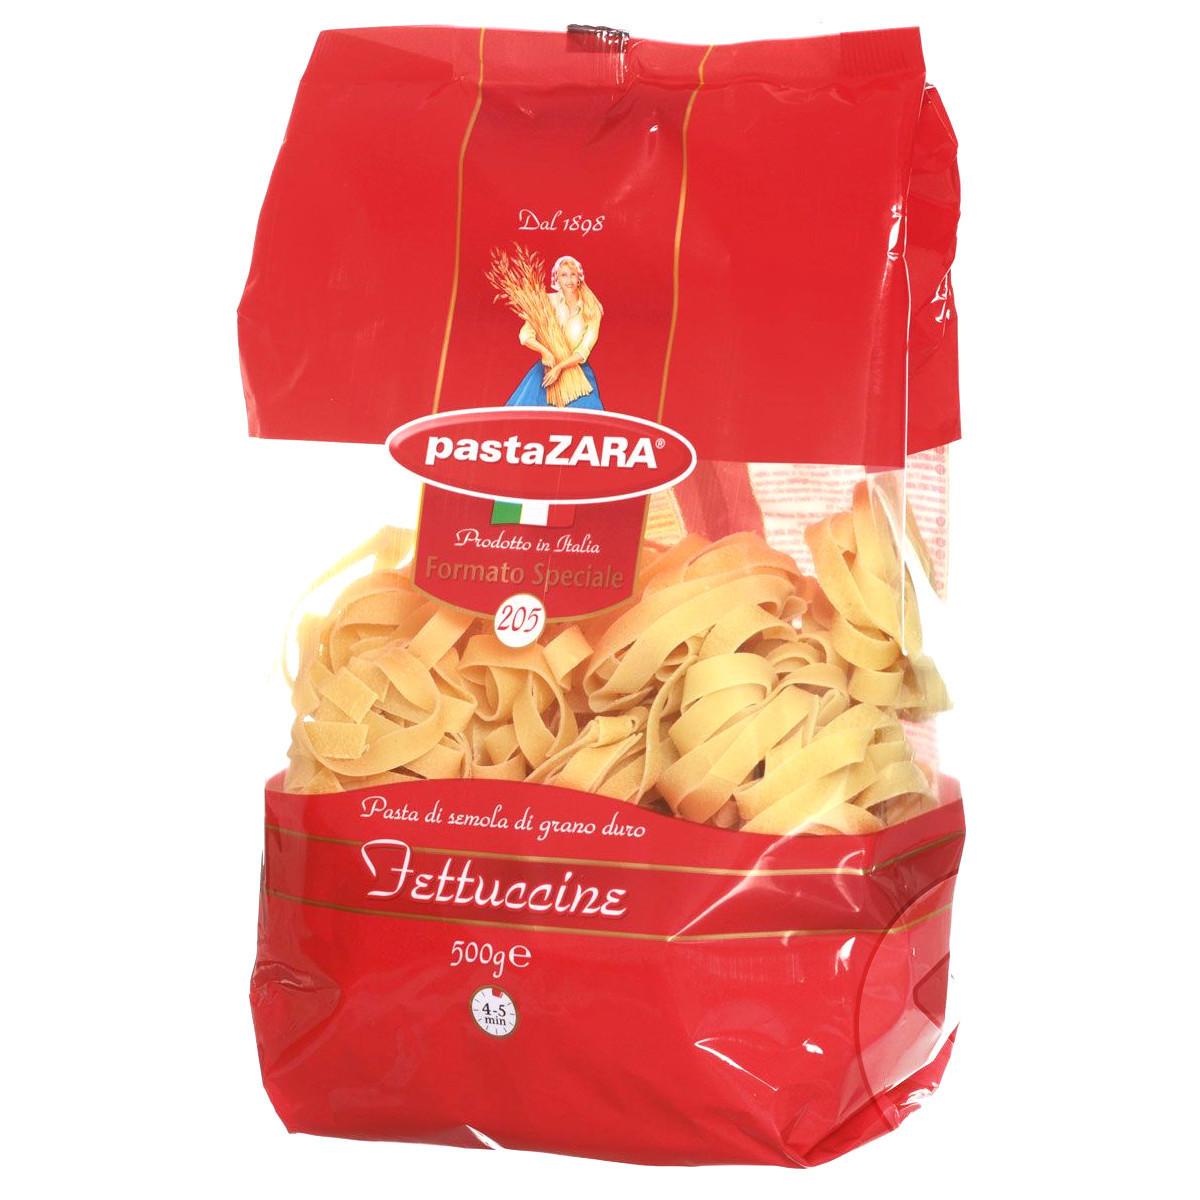 Pasta Zara Клубки яичные широкие Fettuccine макароны, 500 г agnesi тальолини яичные макароны 250 г